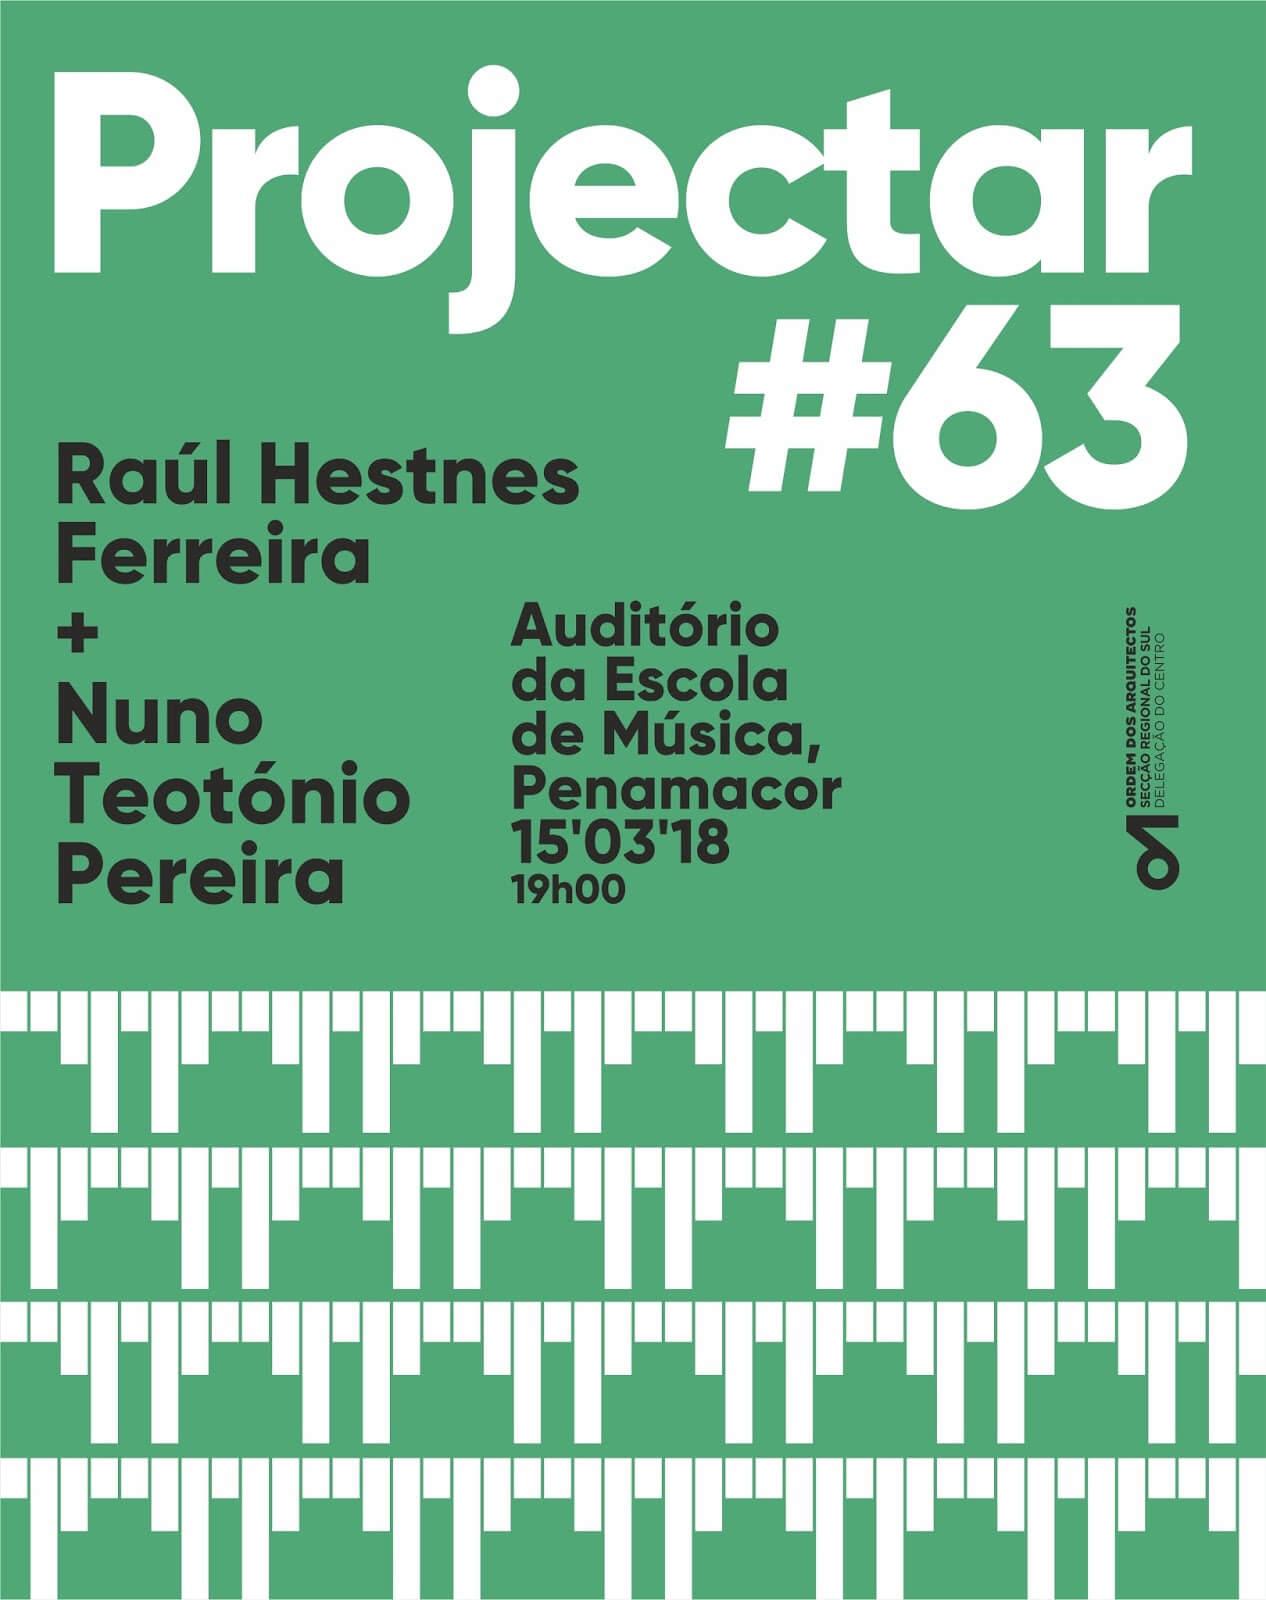 Projectar #63 . Hestnes Ferreira + Teotónio Pereira